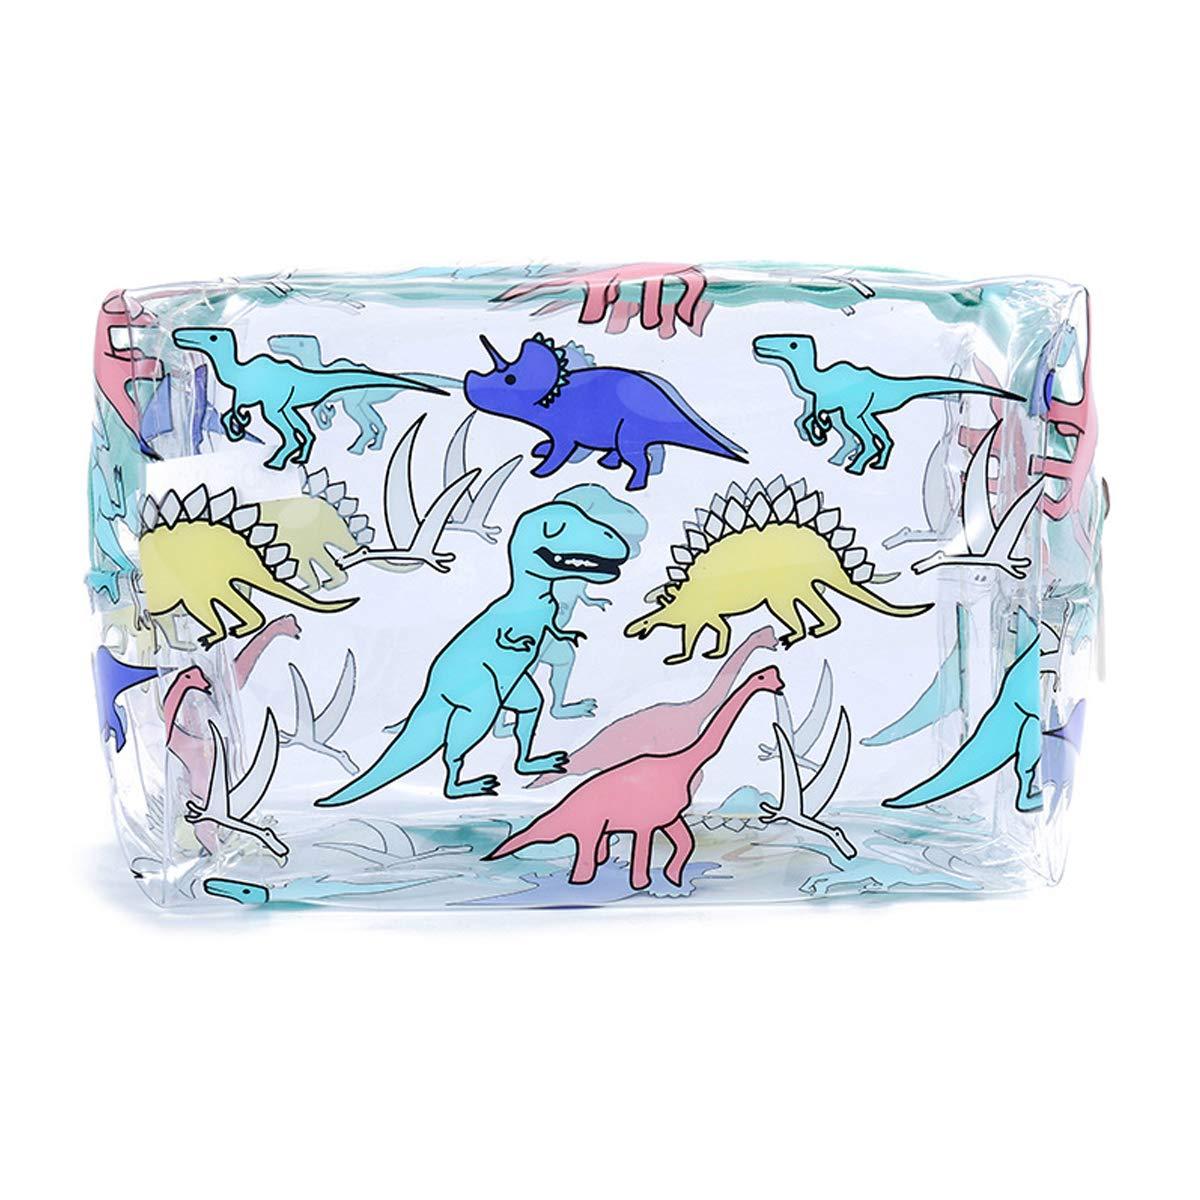 Meetlight Unicorn Transparent Makeup Bag Waterproof Zipper Clear PVC Toiletry Bag Portable Women Travel Cosmetic Bags (Dinosaur Blue)